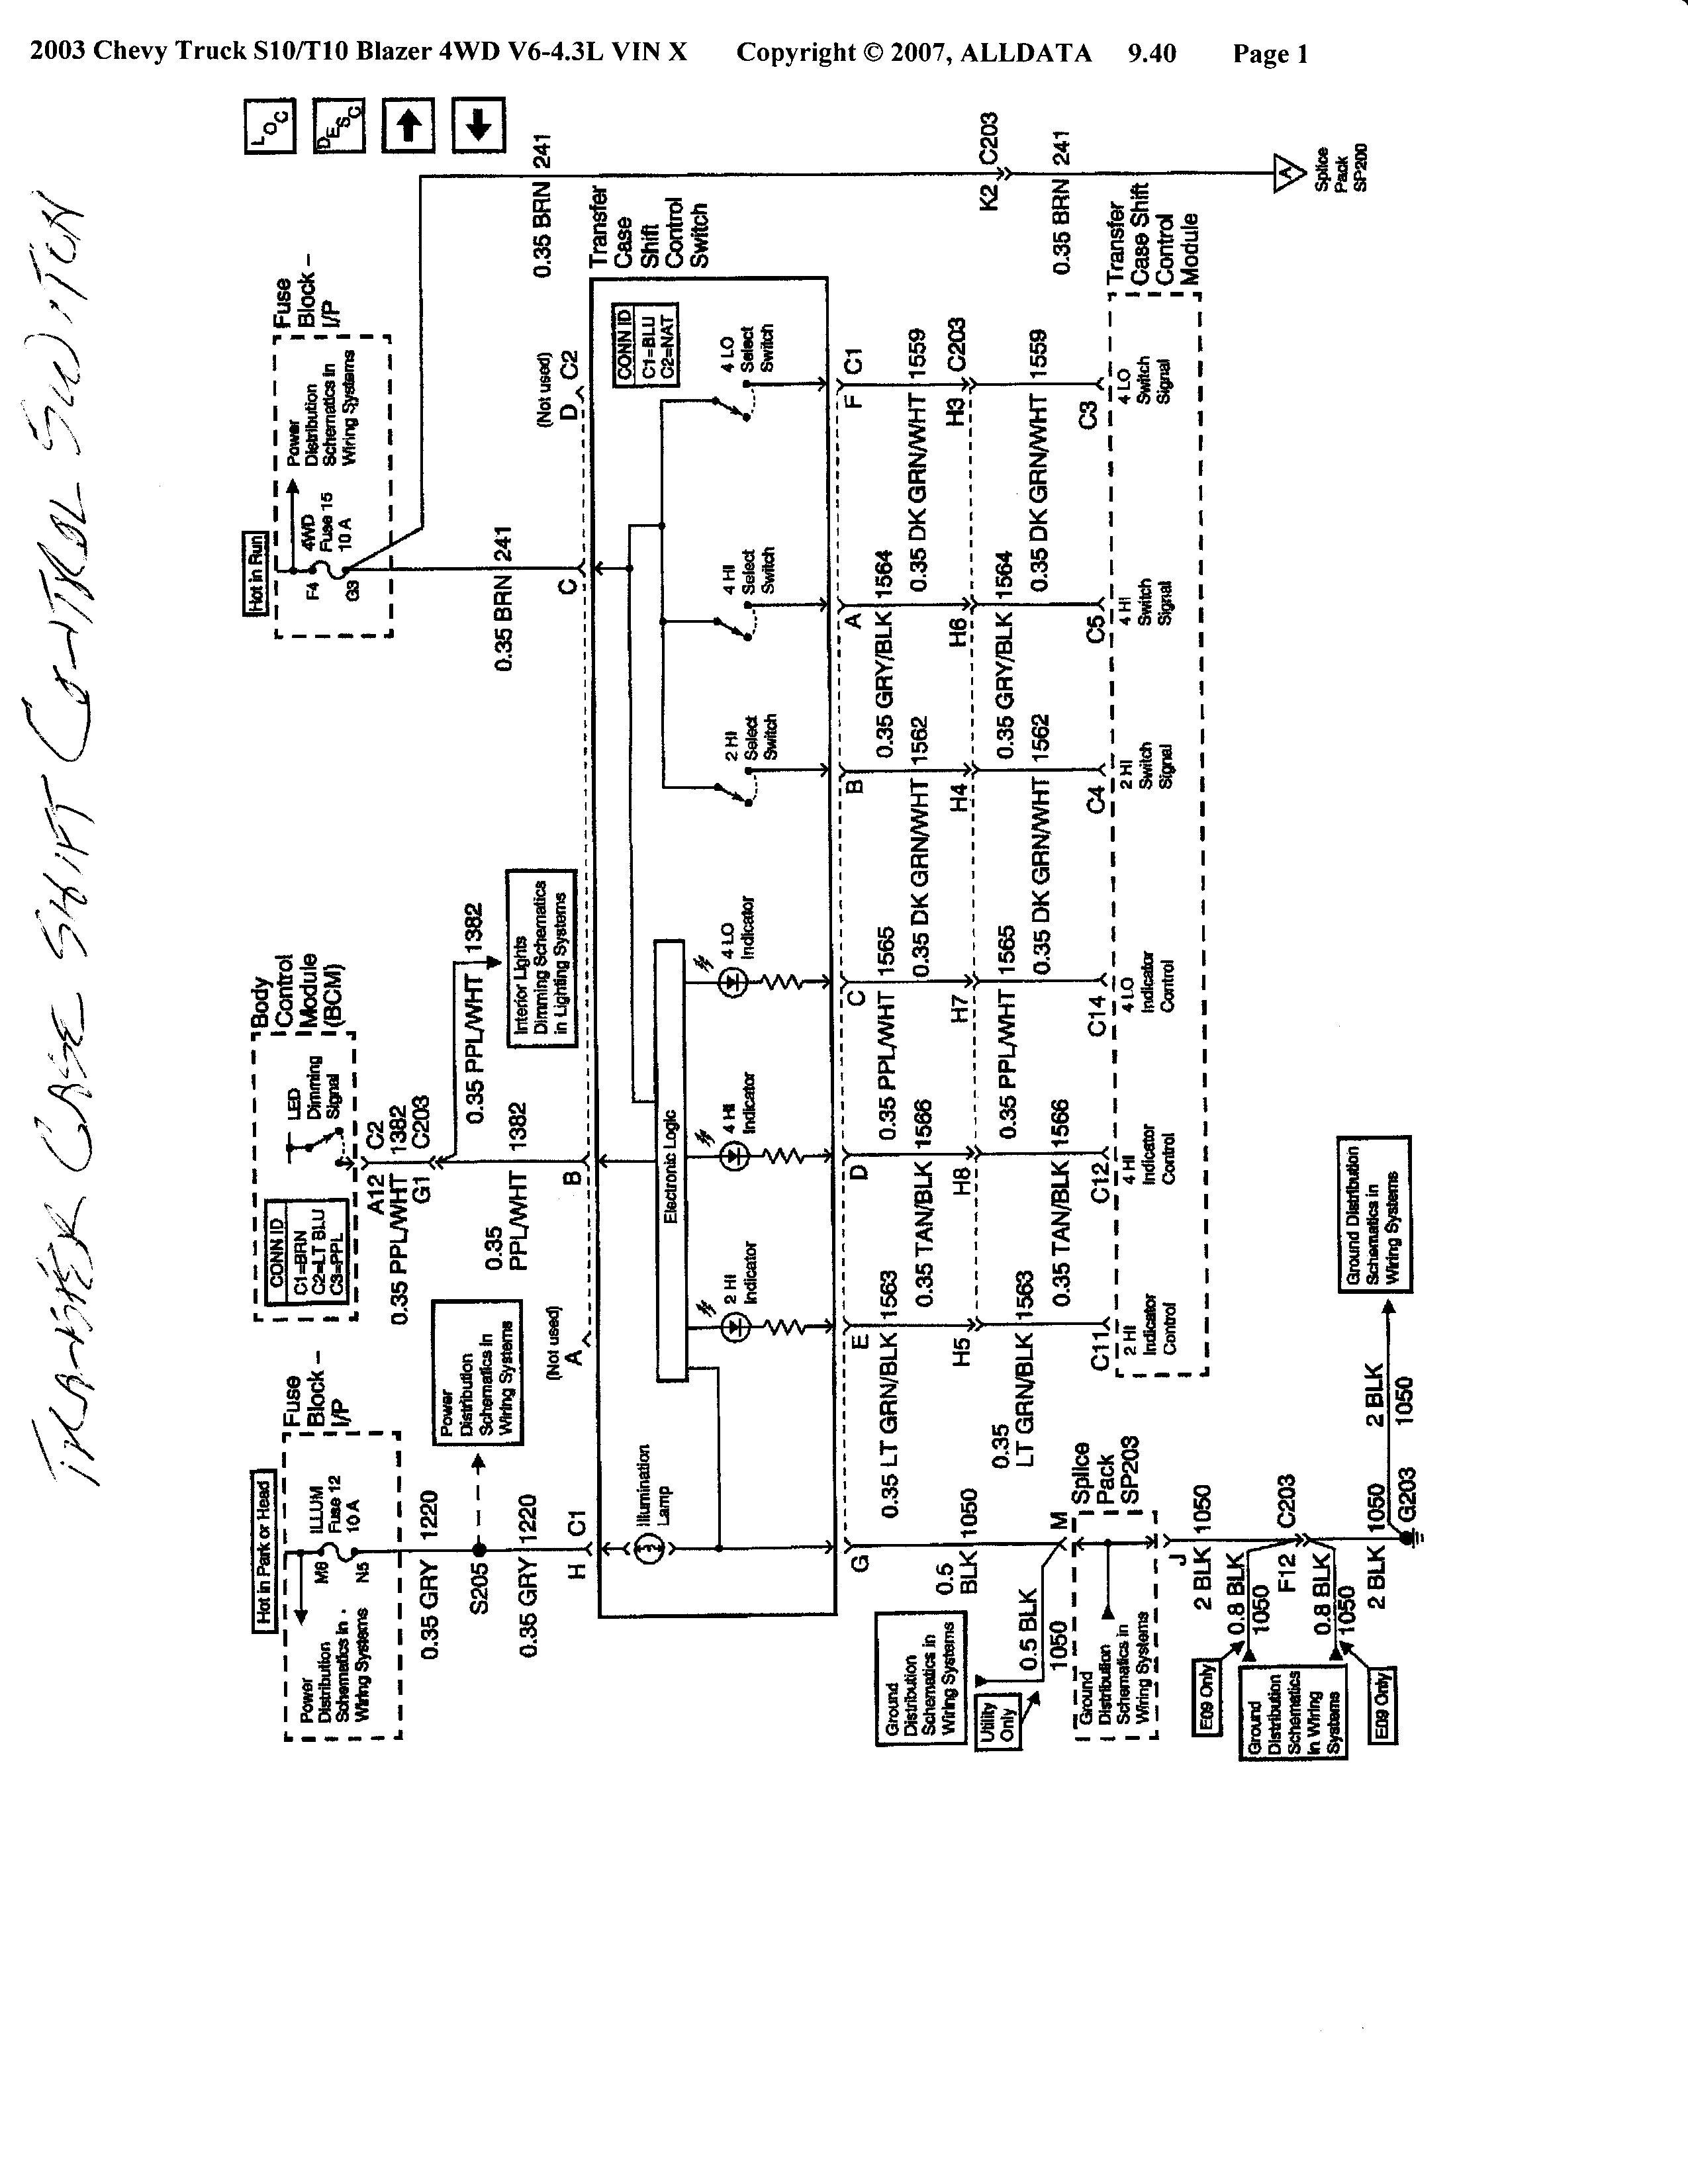 Wiring Diagram PDF: 01 Blazer Transmission Wiring Diagram